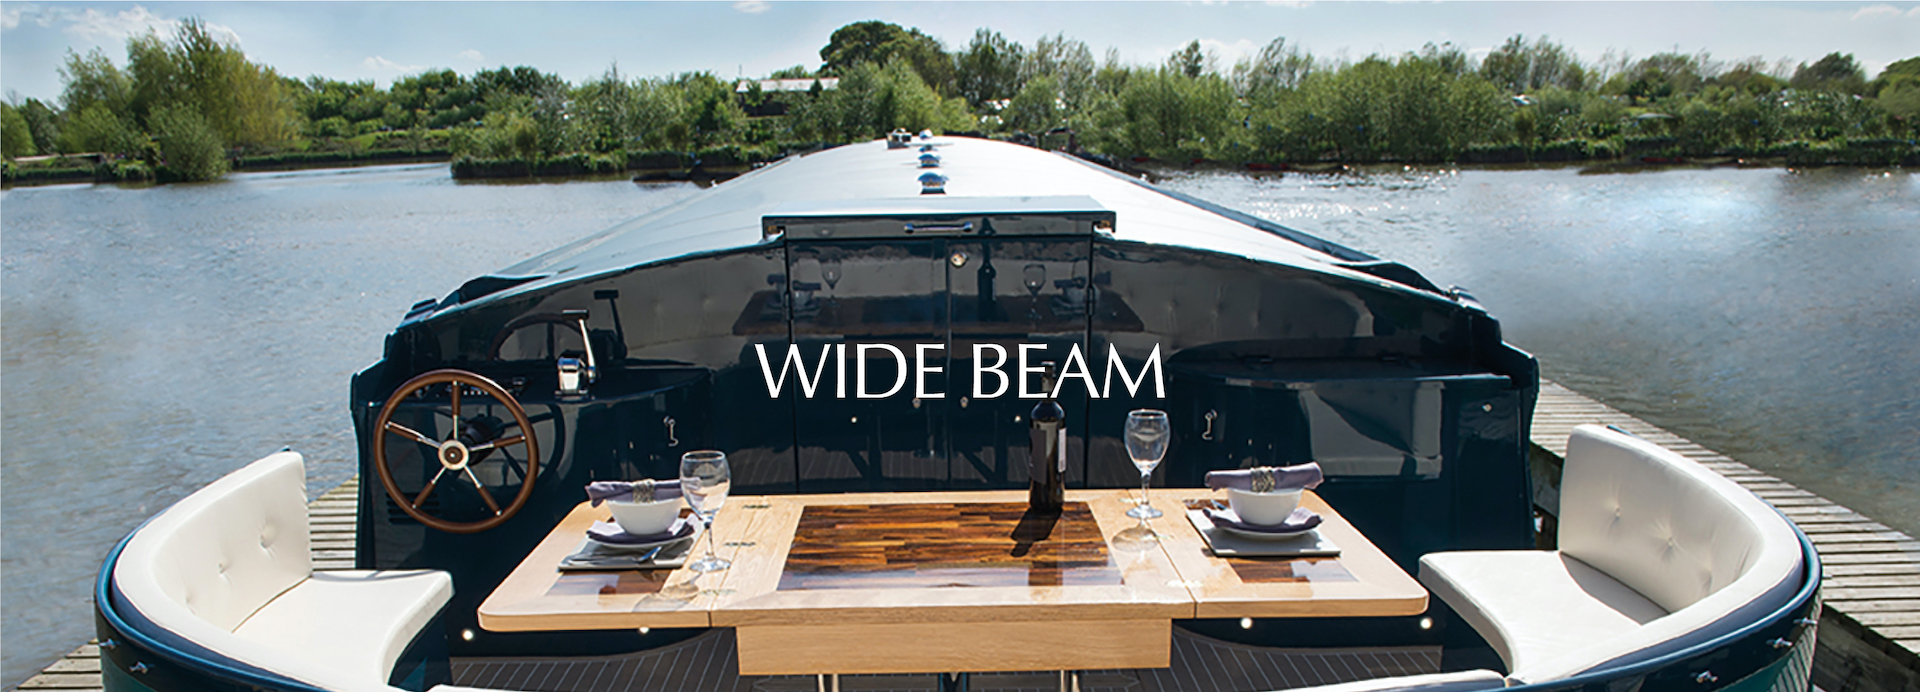 Wide Beam